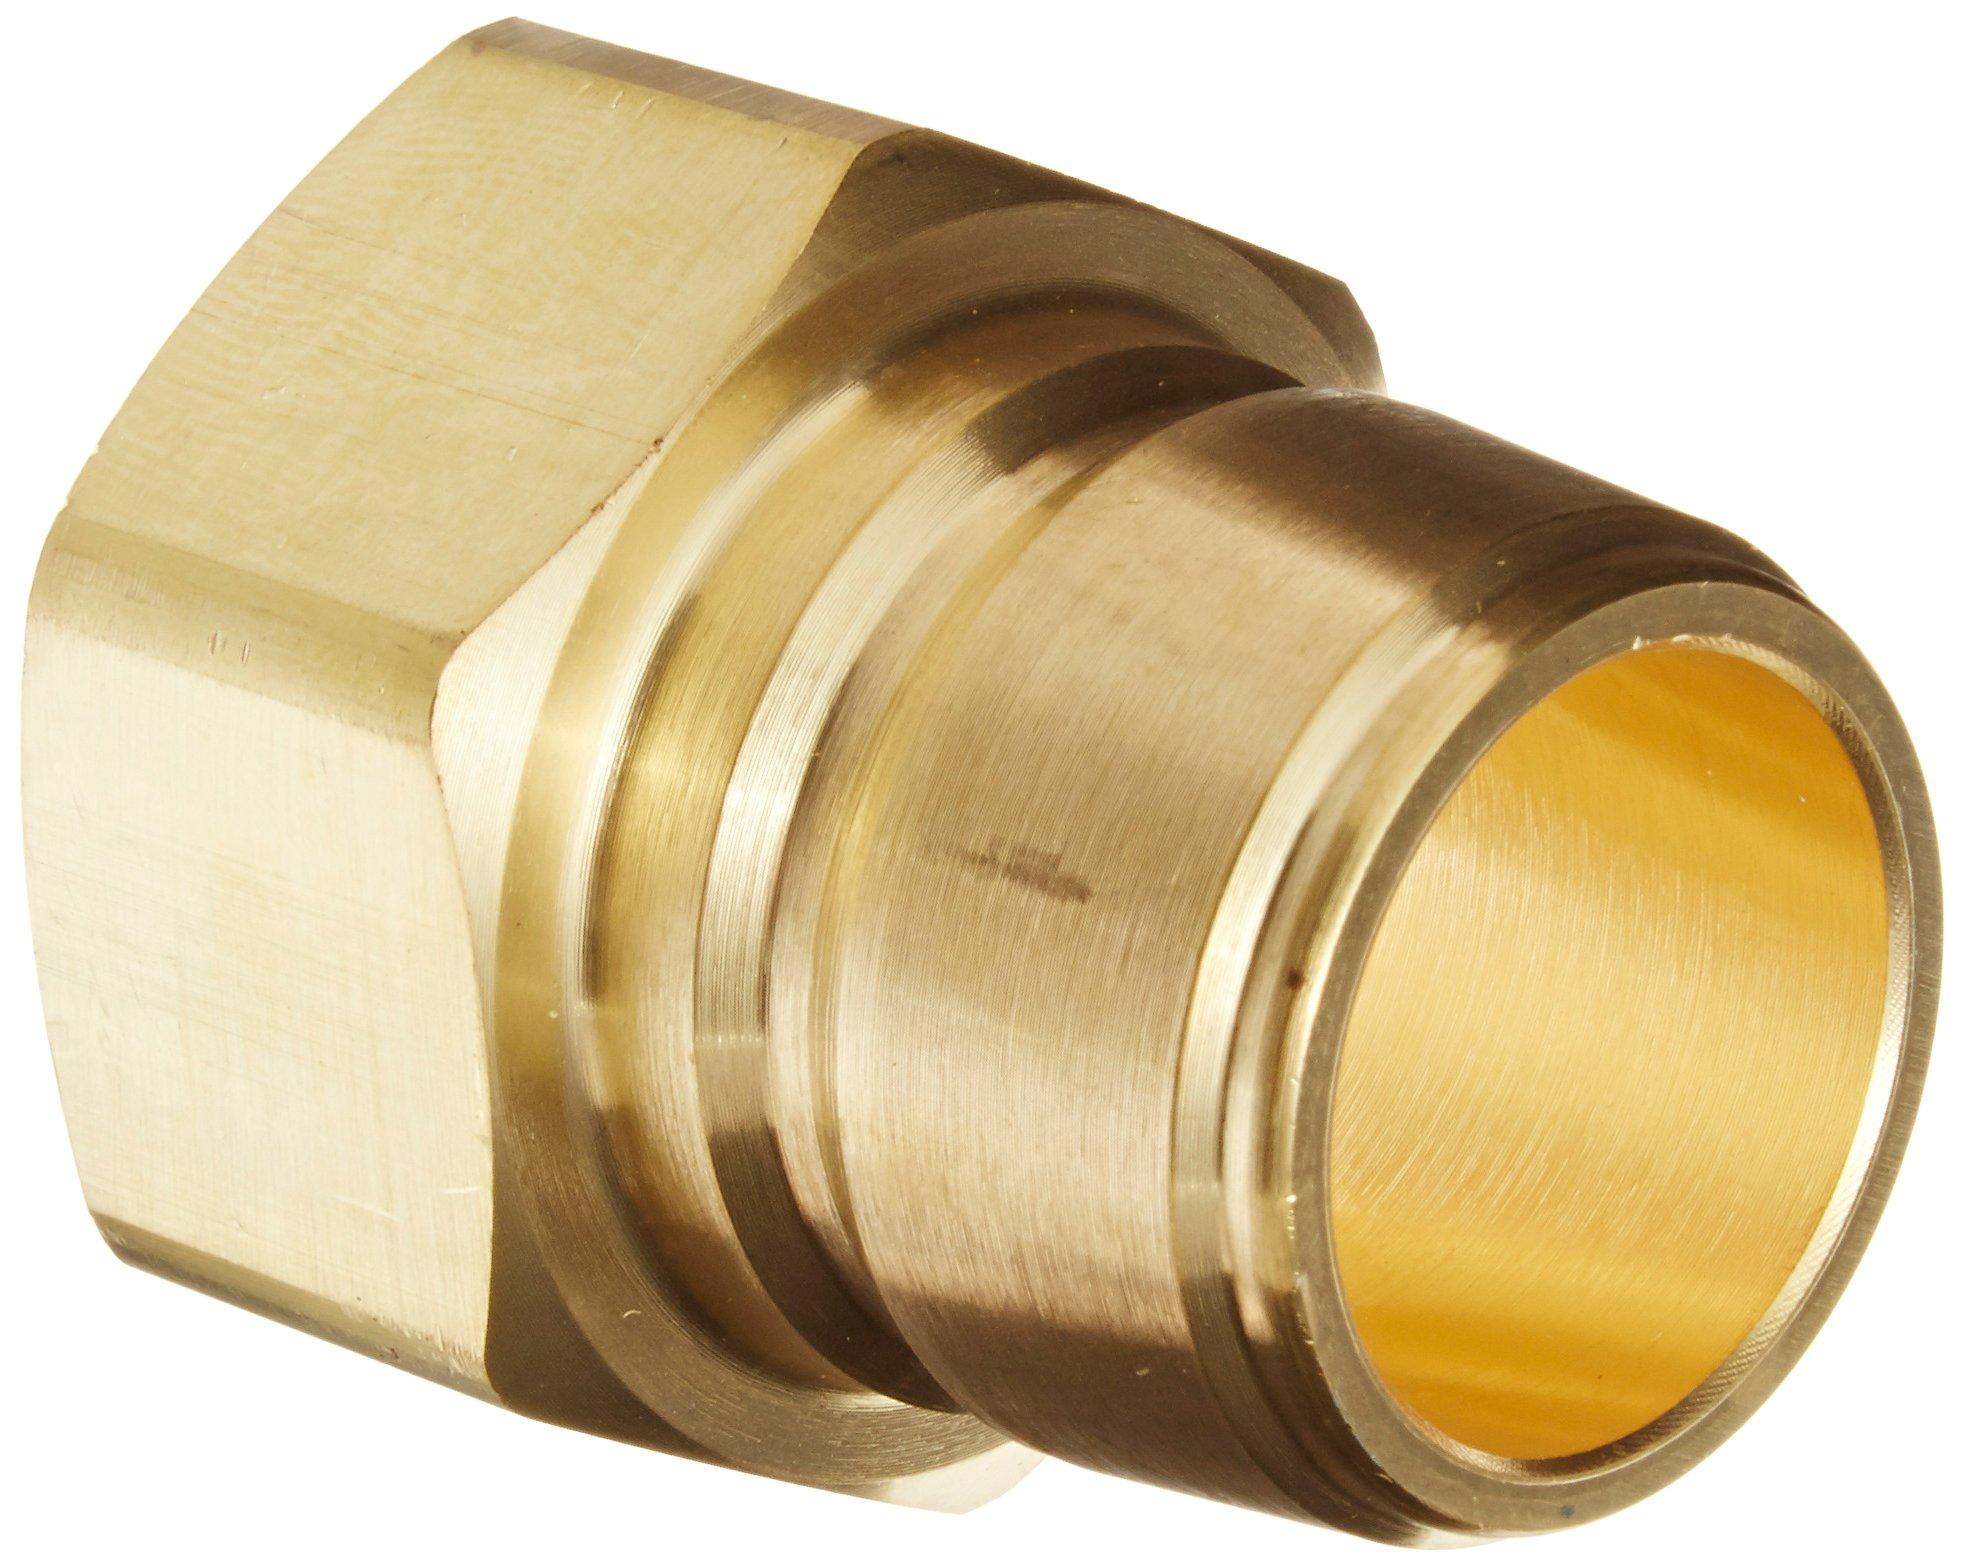 Eaton Hansen B10T41 Brass Straight Through Ball Lock Hydraulic Fitting, Plug, 1-1/4''-11-1/2 NPTF Female, 1-1/4''Port Size, 1-1/4''Body